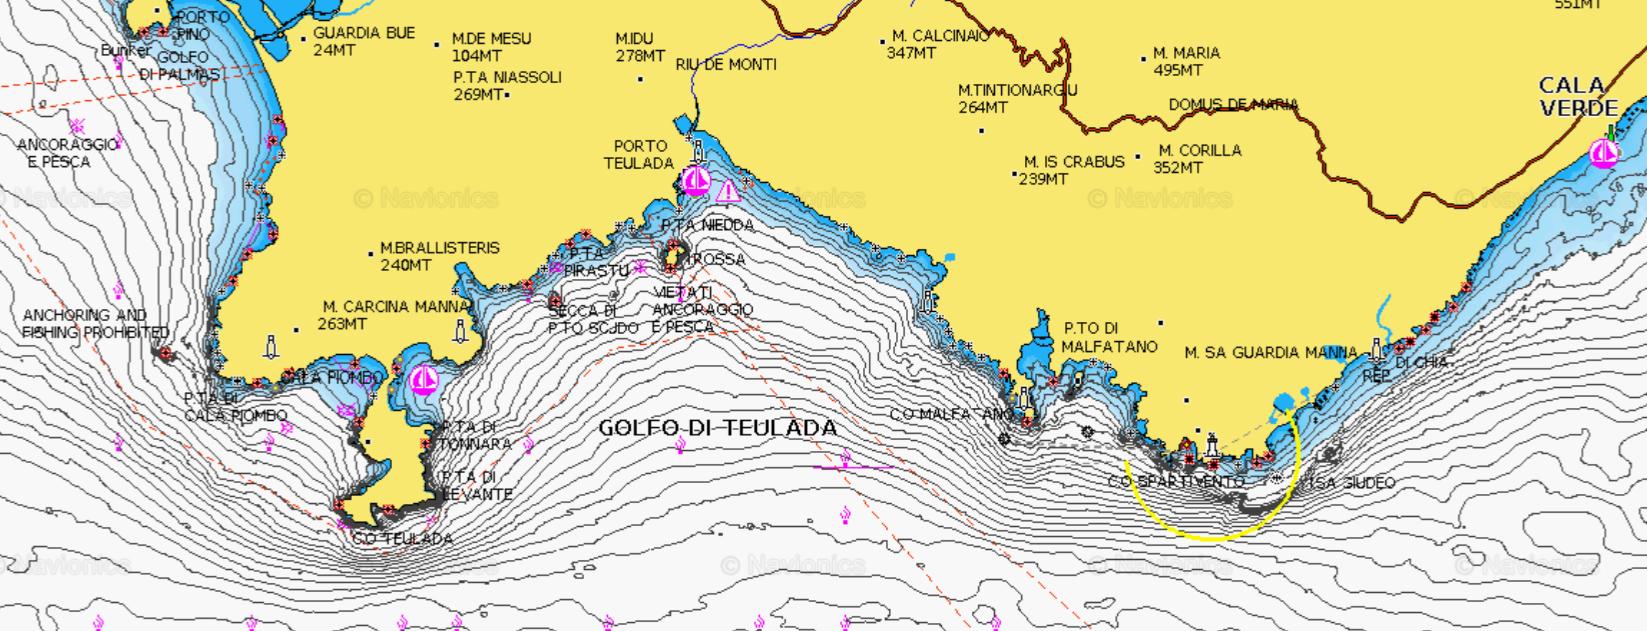 Sardegna Sardinia intotheblue.it